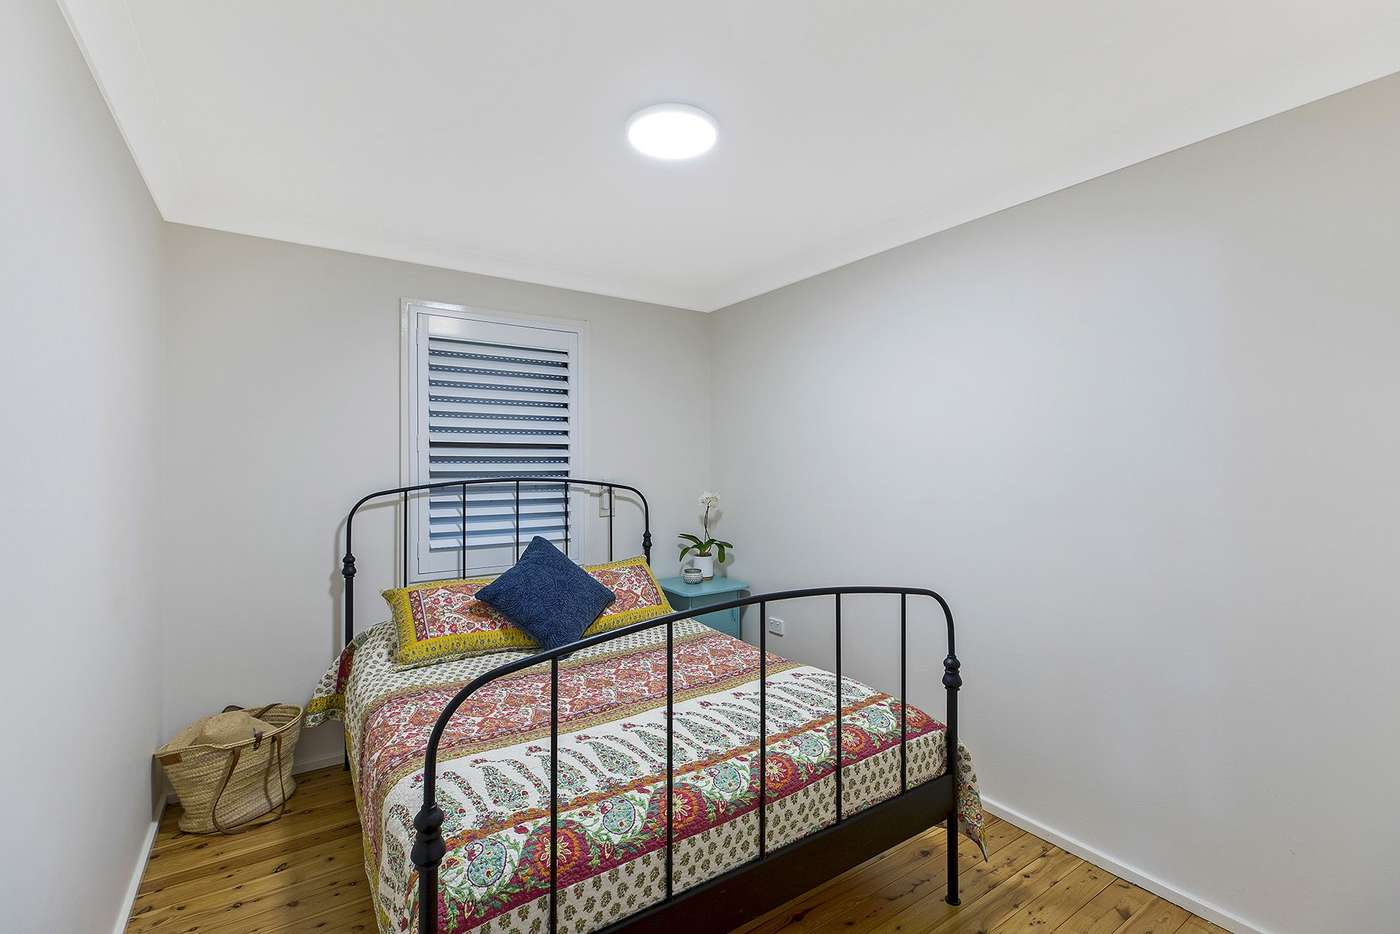 Sixth view of Homely house listing, 39 Huene Avenue, Halekulani NSW 2262